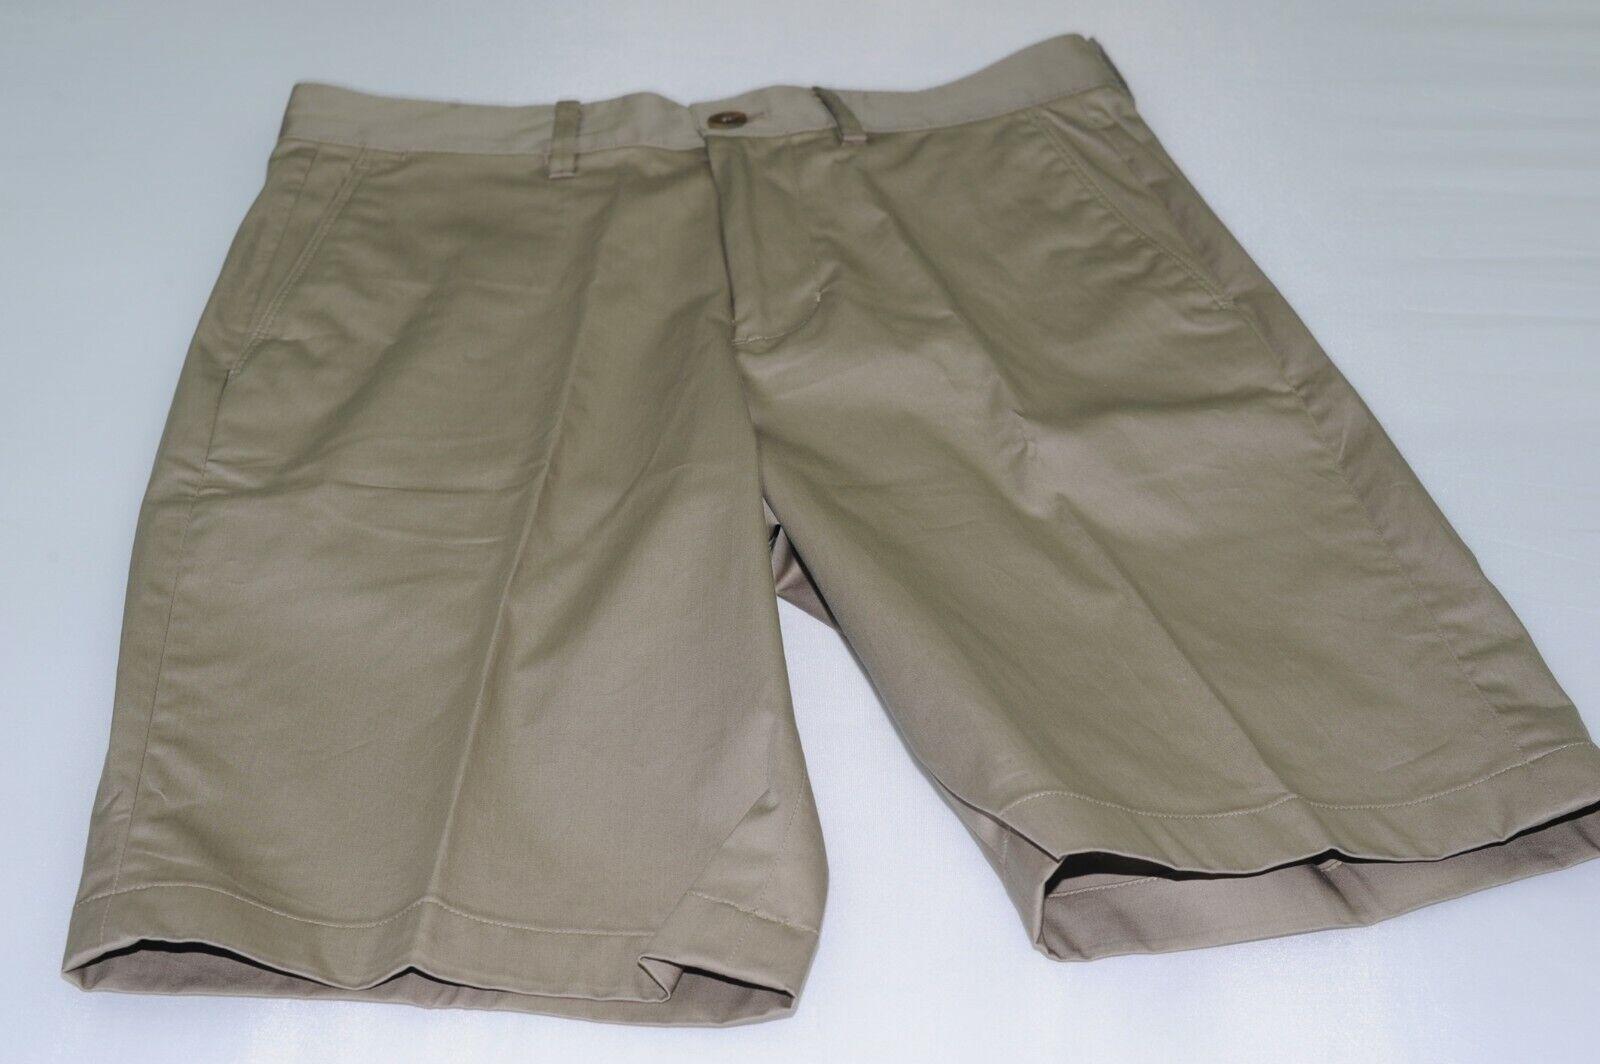 NWOT Vince Men's Flat Front Cotton Blend Stretch Casual Shorts Size 28X10